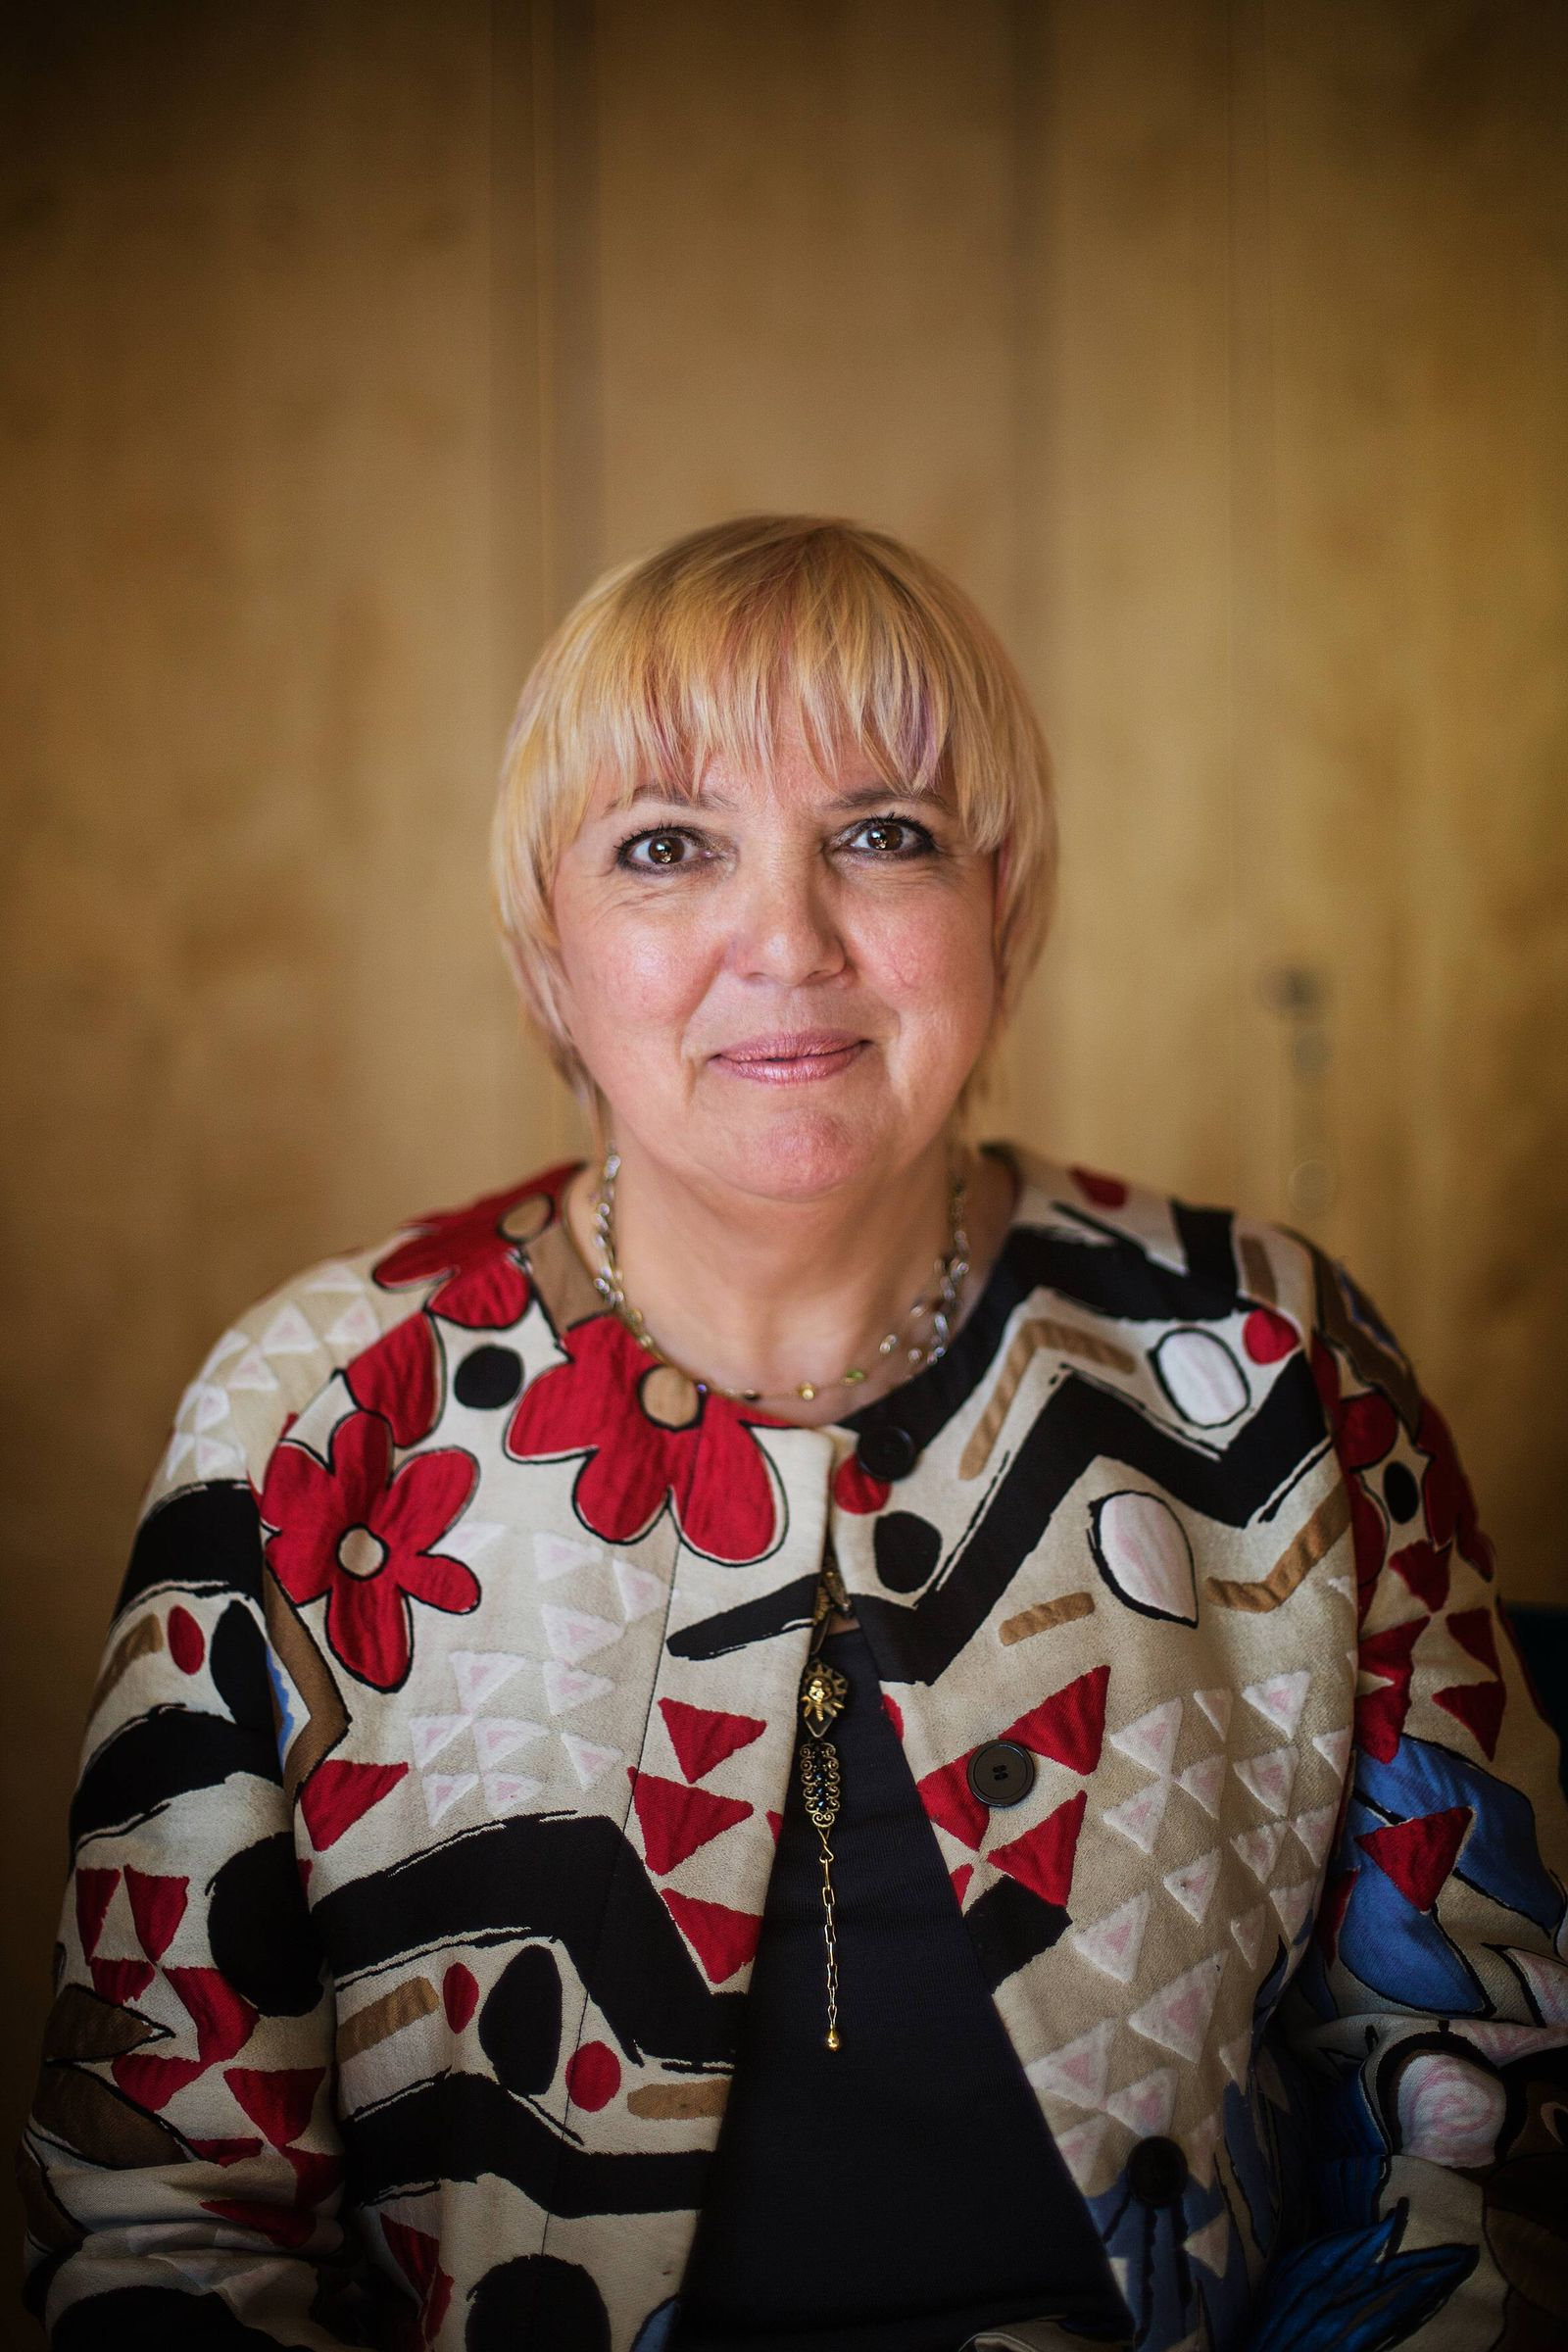 EINMALIGE VERWENDUNG SP 46/2019 S. 32 - Claudia Roth